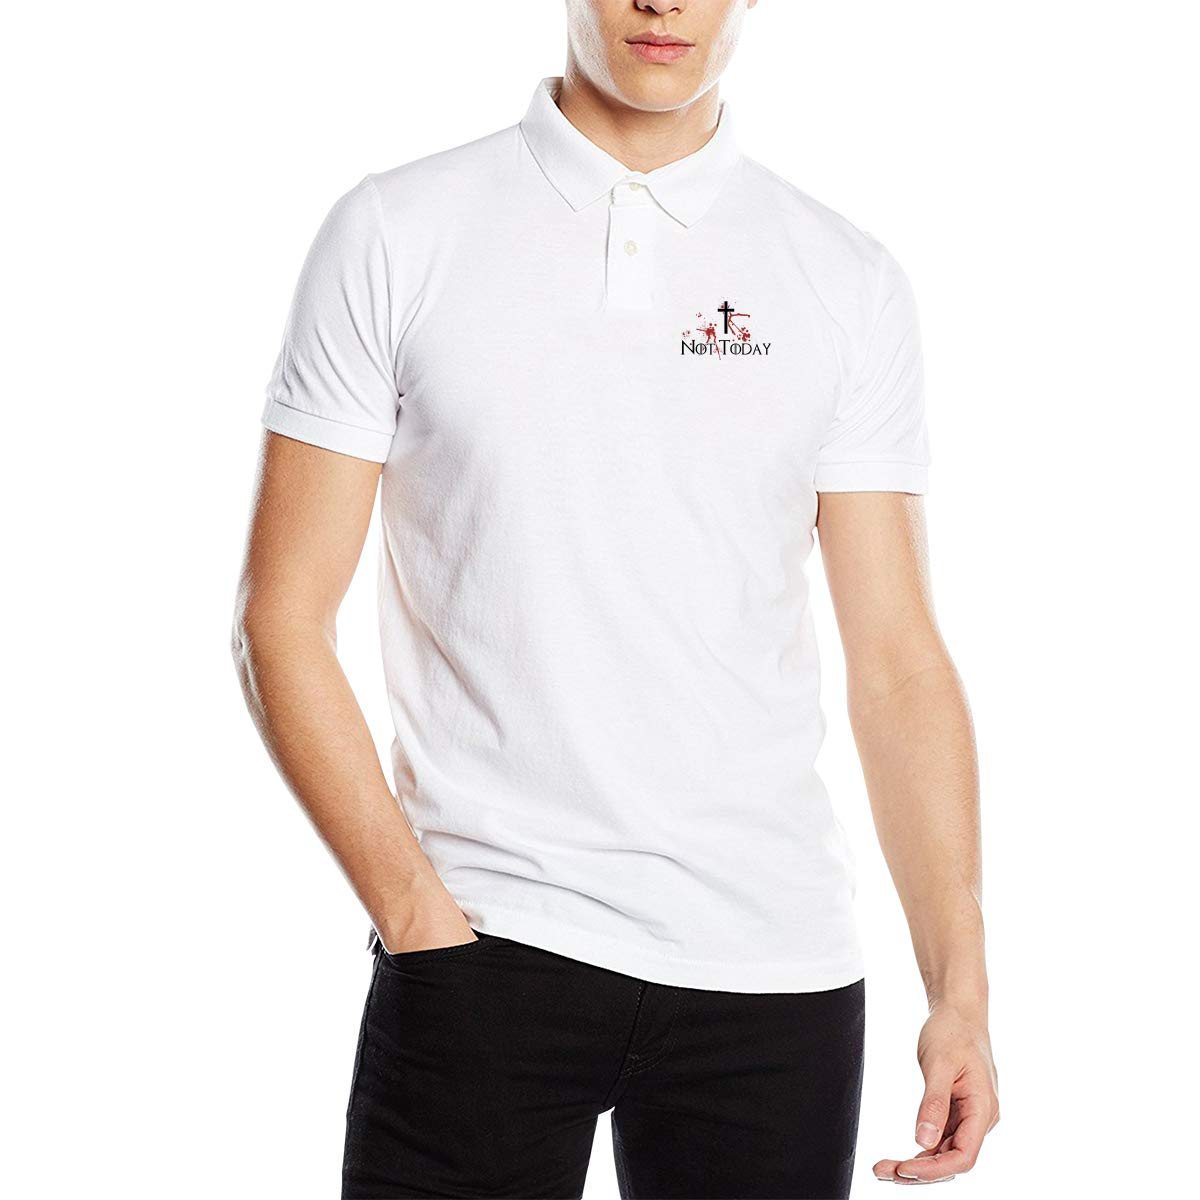 Arilce Not Today Arya-Stark Men Polo Shirt Short Sleeve Lapel Blouse Black